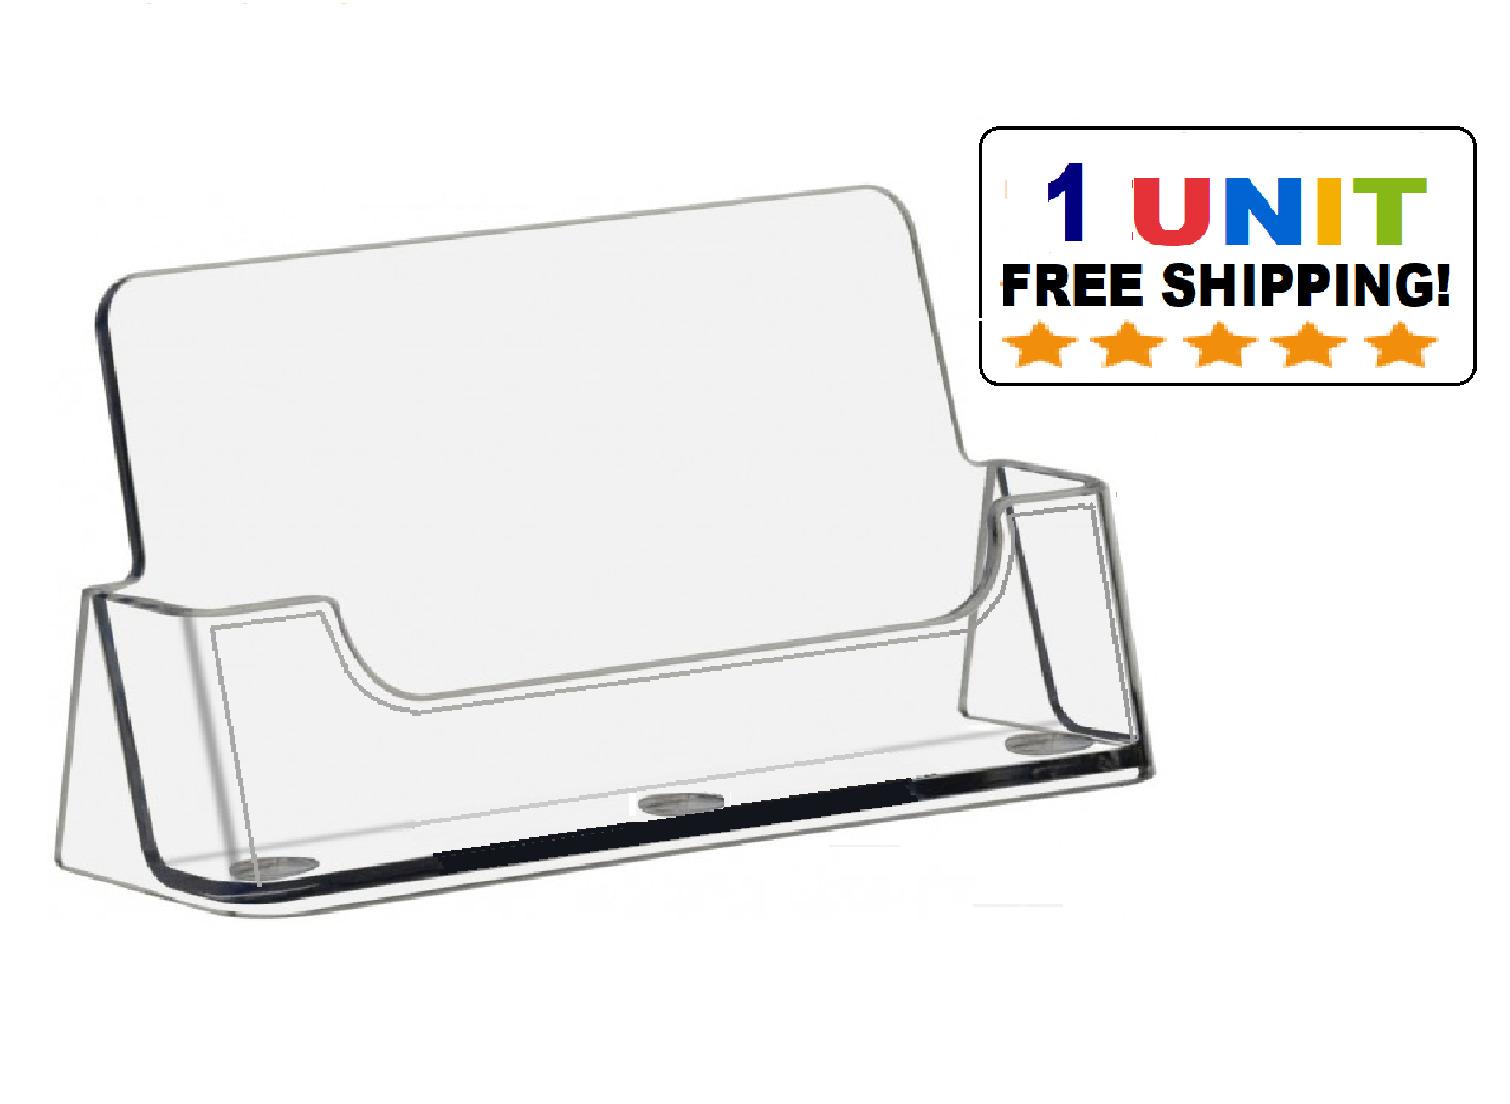 2 Pocket Acrylic Desktop Business Card Holder Clear Countertop ...